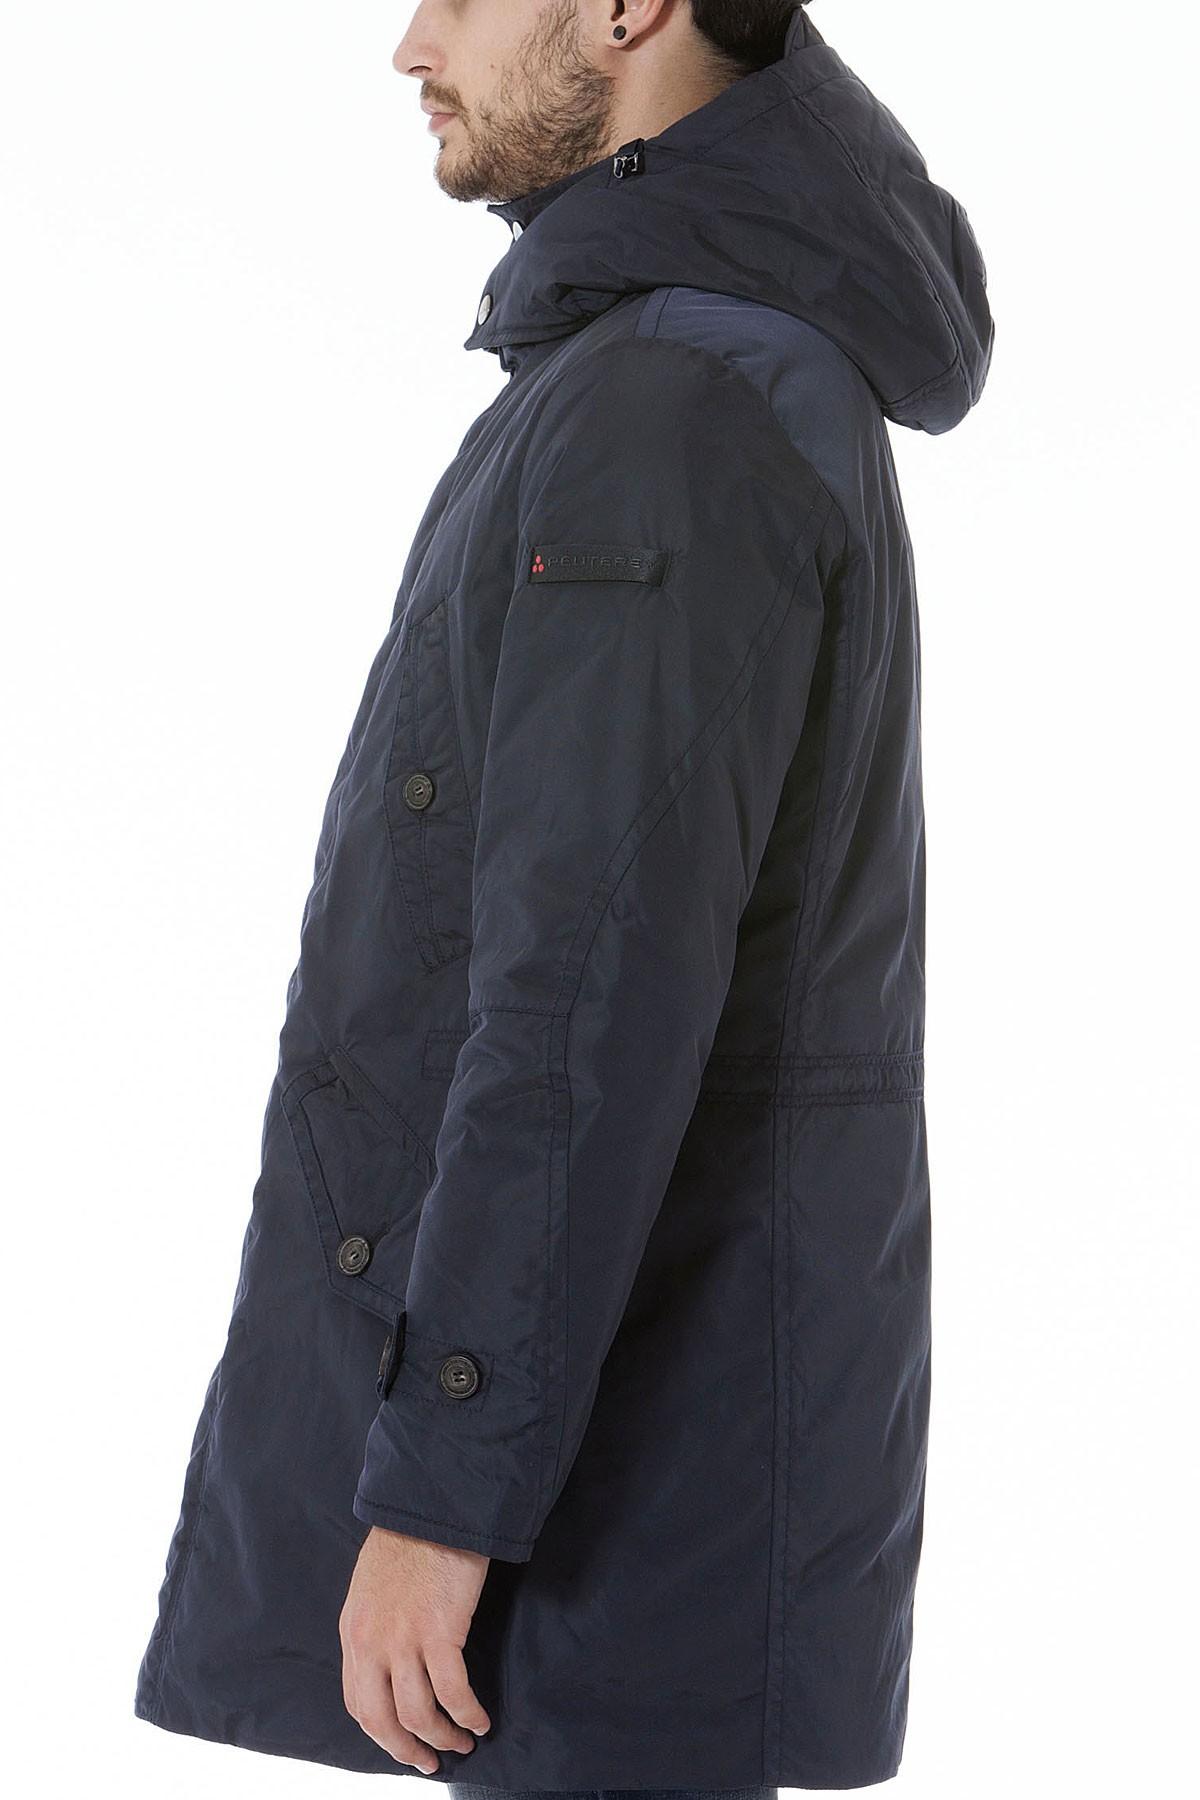 6b2931126764 PEUTEREY Blue jacket for man autumn winter 14-15 - Rione Fontana